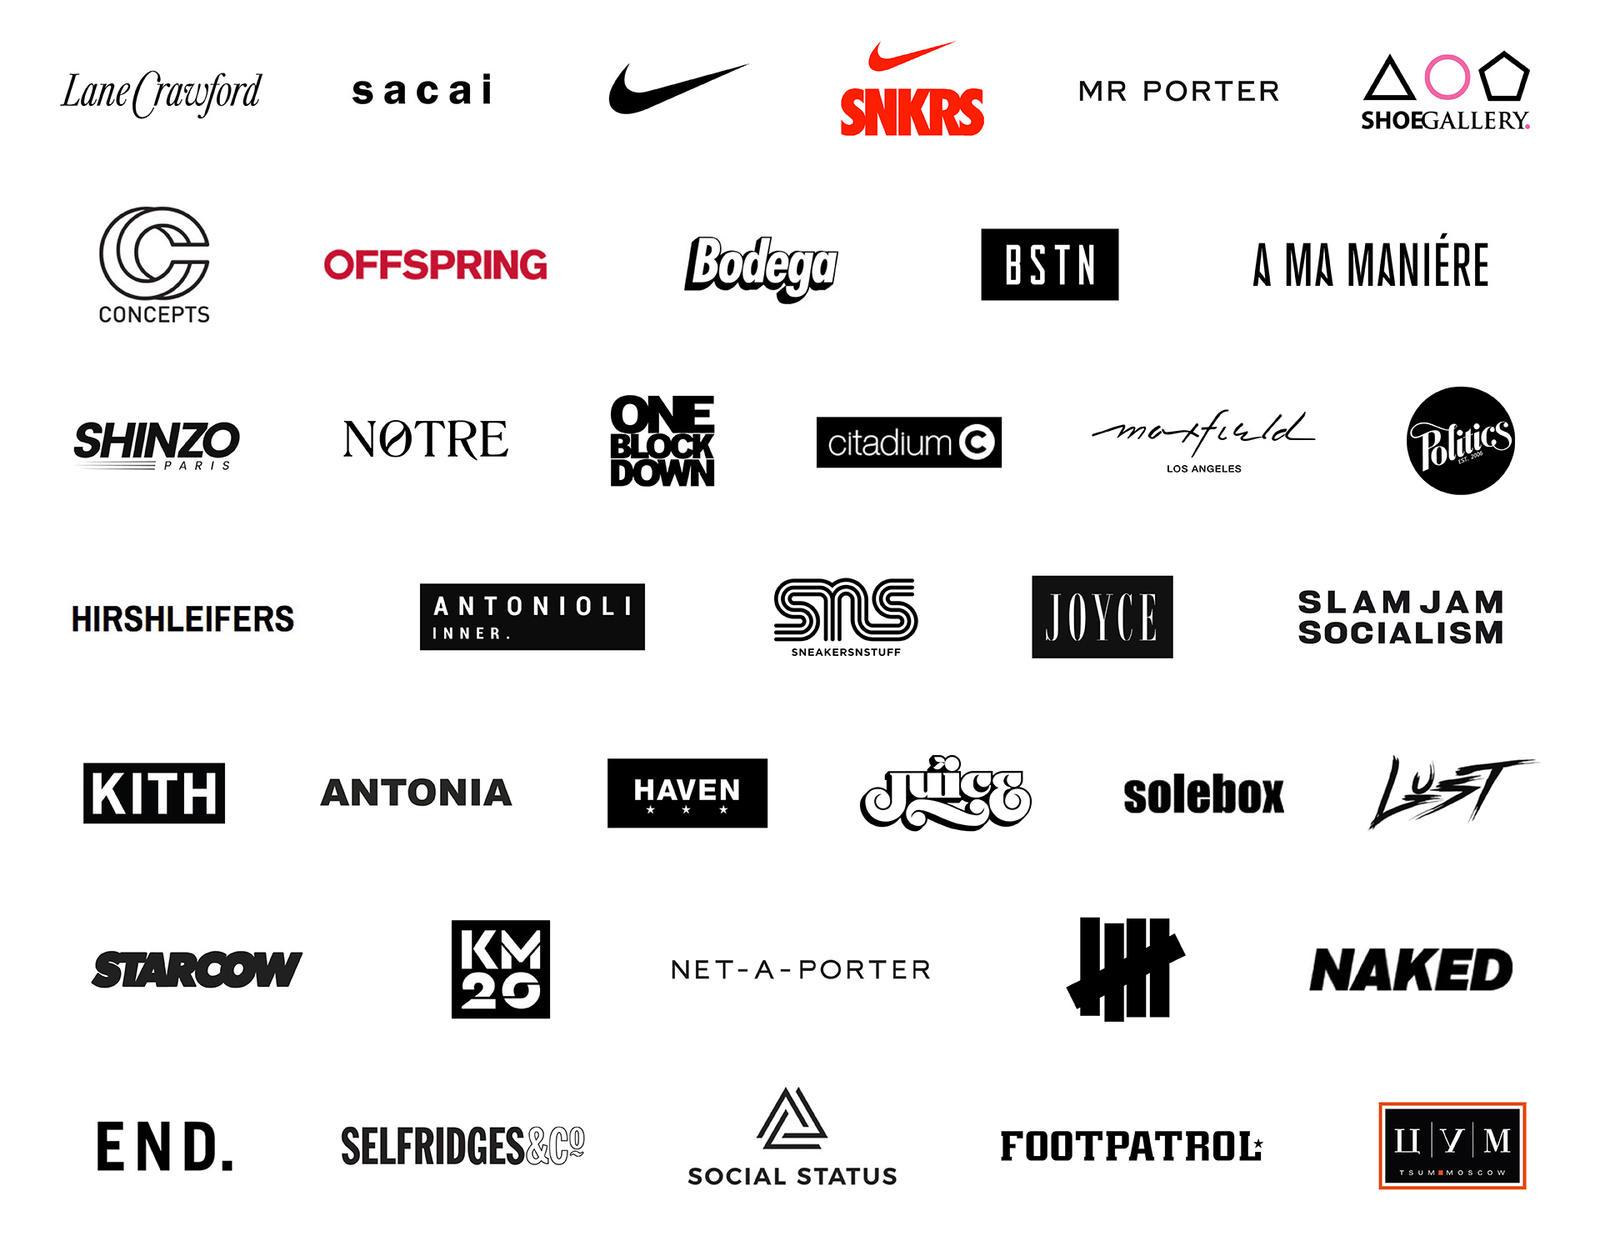 Sacai x Nike Stockists